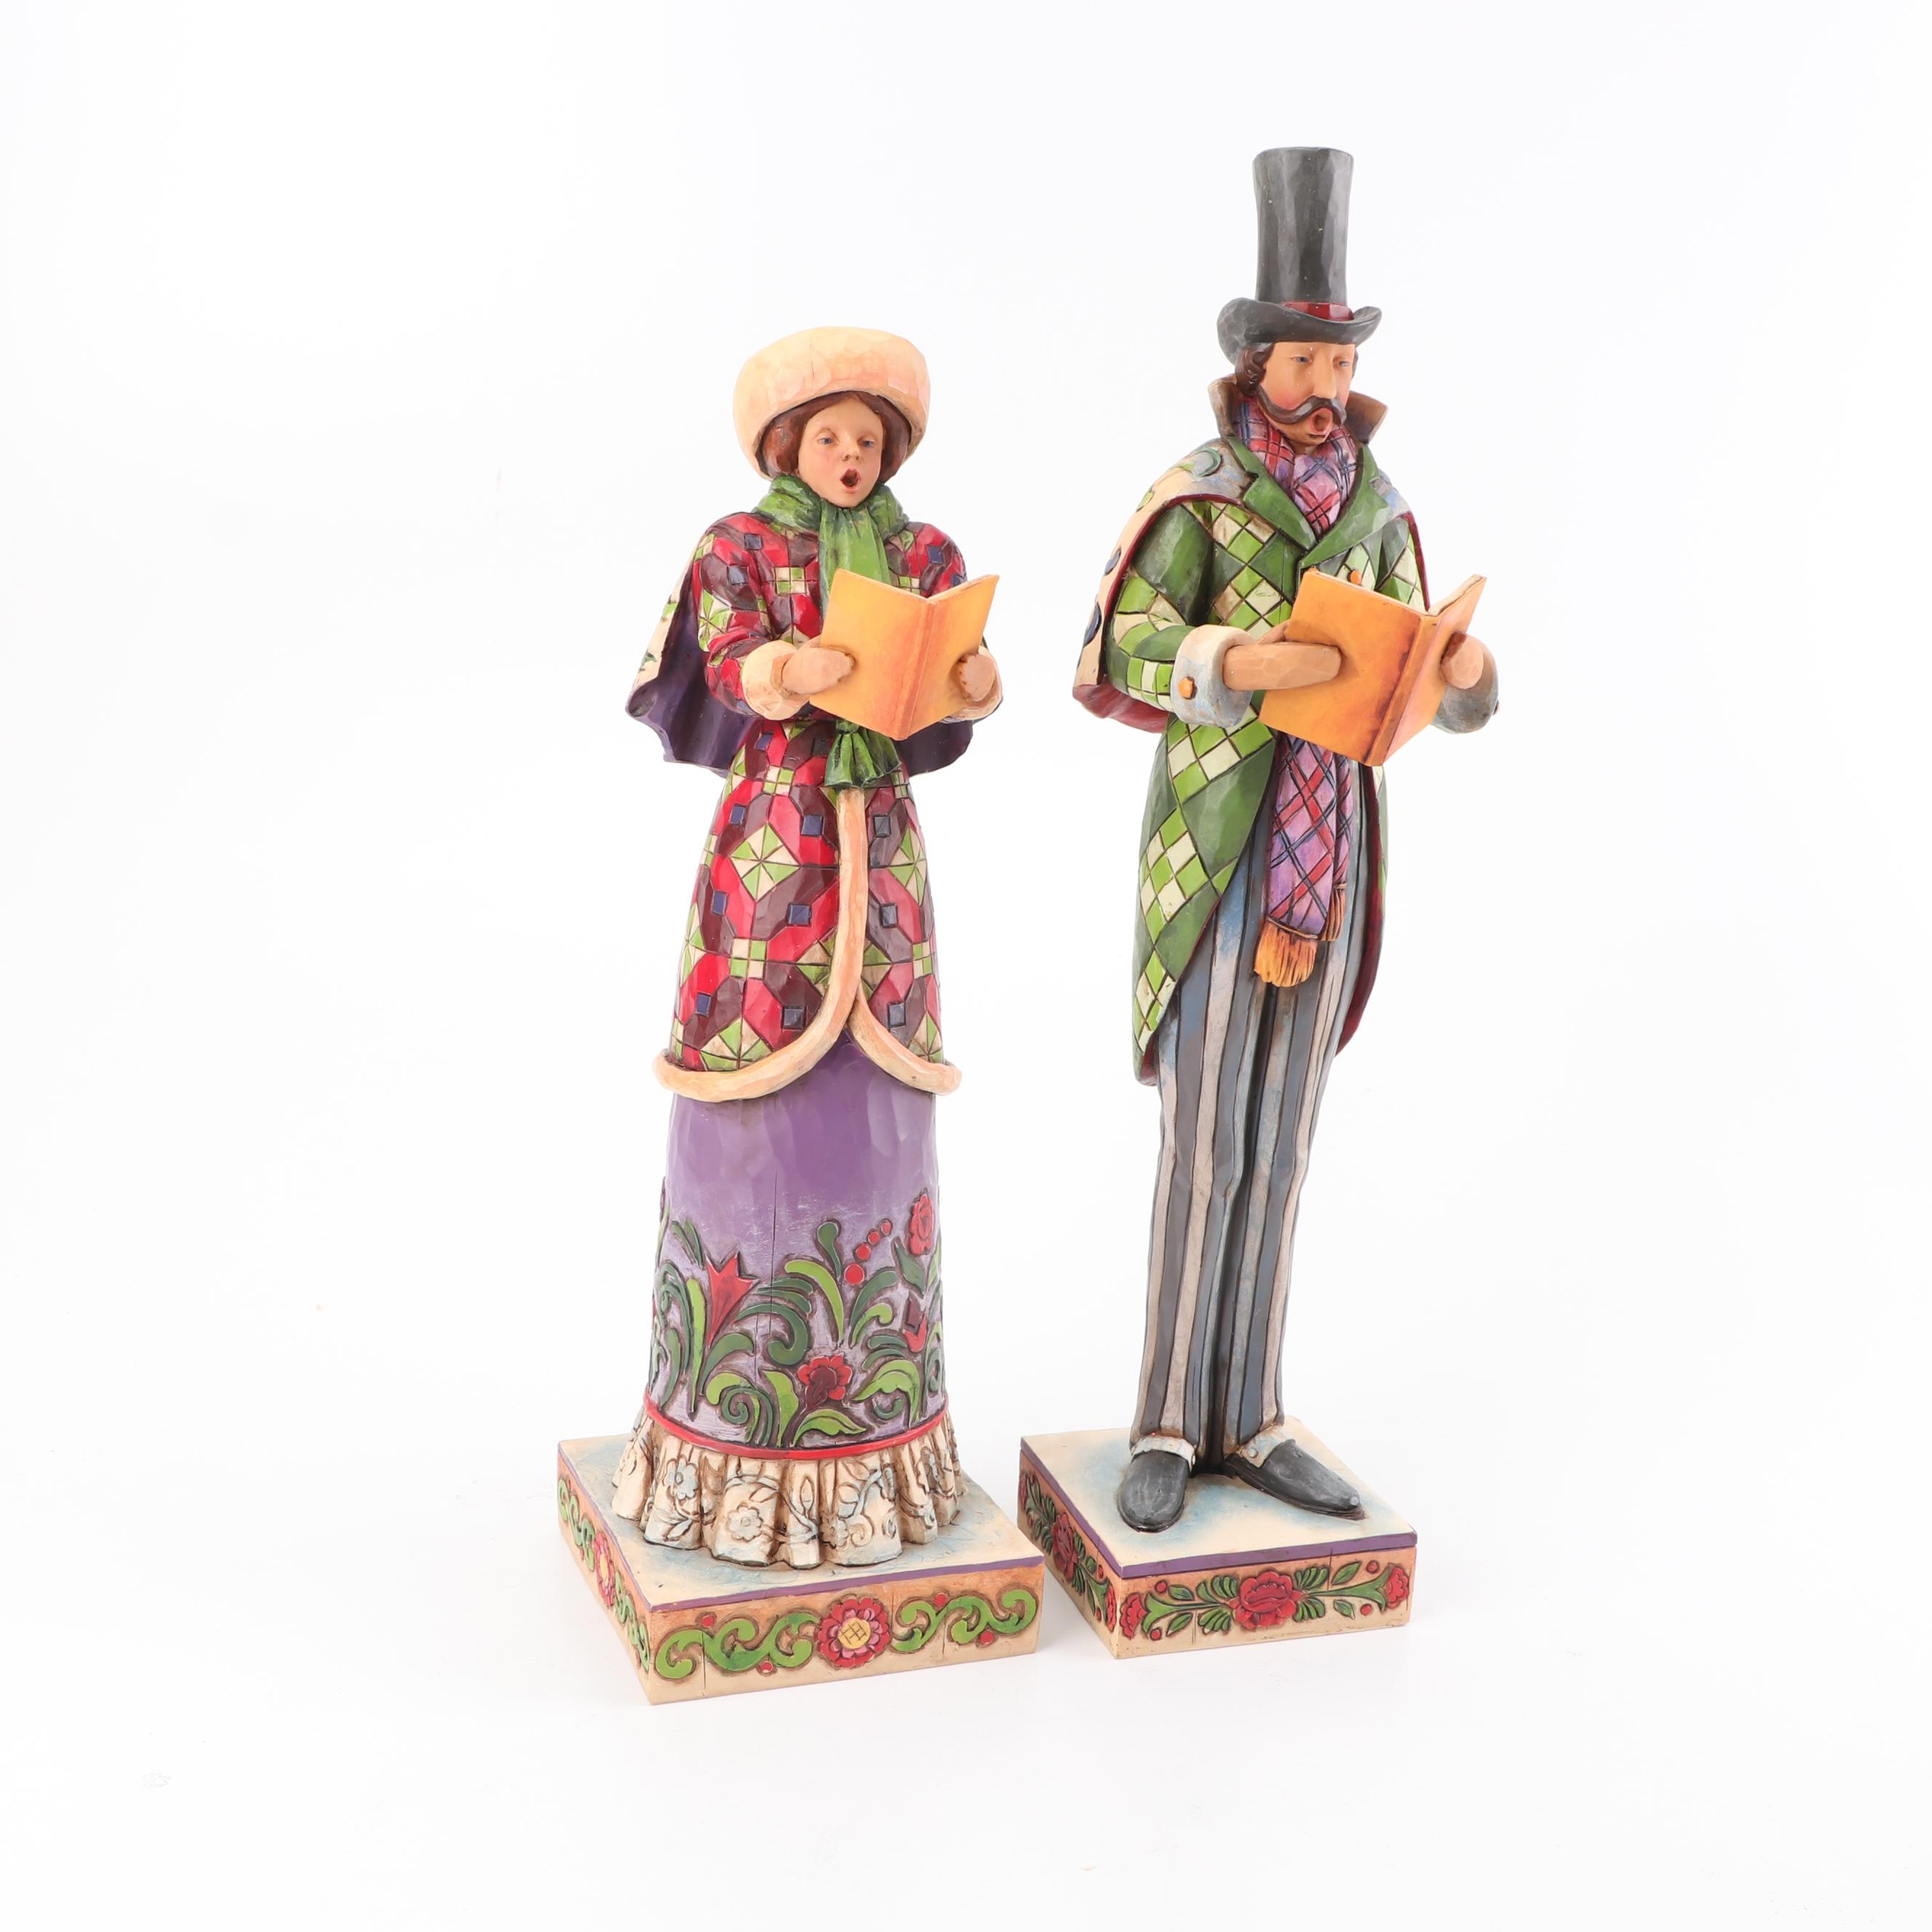 Jim Shore Heartwood Creek Caroling Figurines